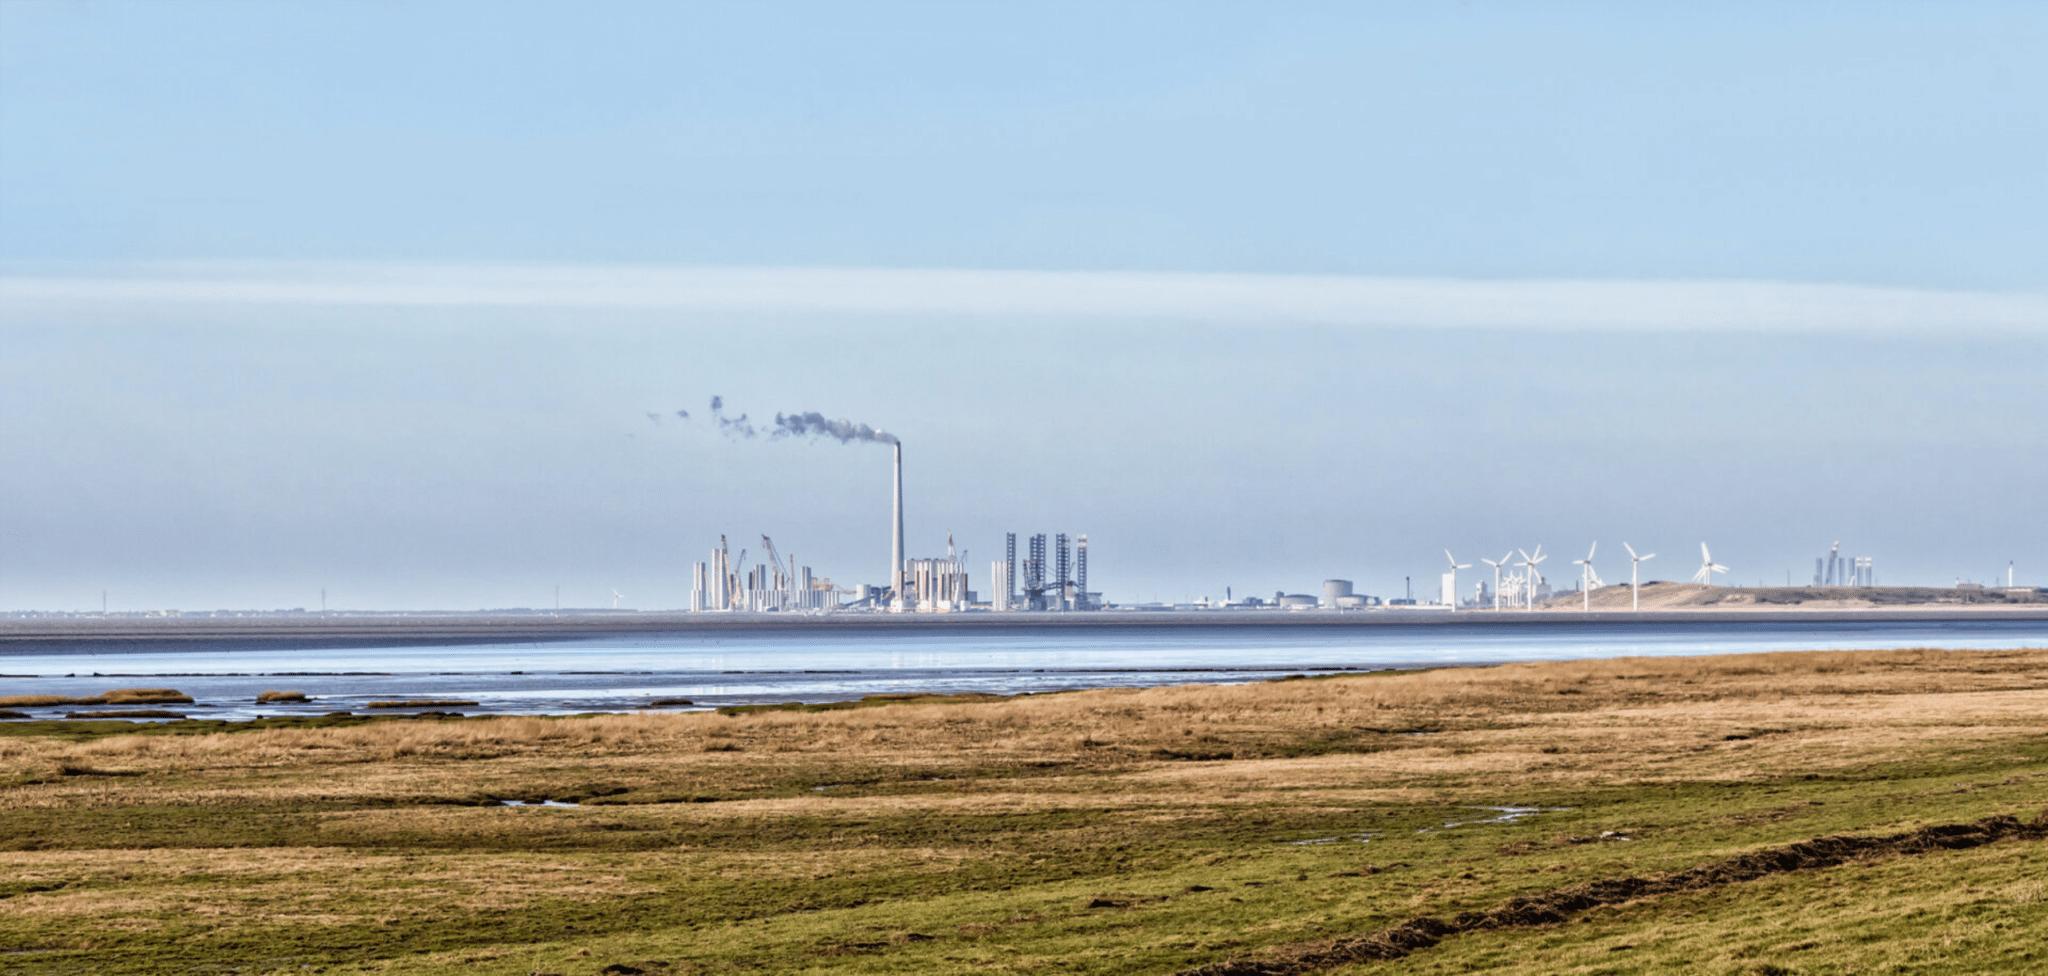 Apple, turbine eoliche, eolico, rinnovabili, data center, Esbjerg, Viborg, Danimarca, carbon neutrality, energia, cambiamento climatico, gas serra, partnership, impianti ex-novo, on shore, transizione energetica, Energy Close-up Engineering.